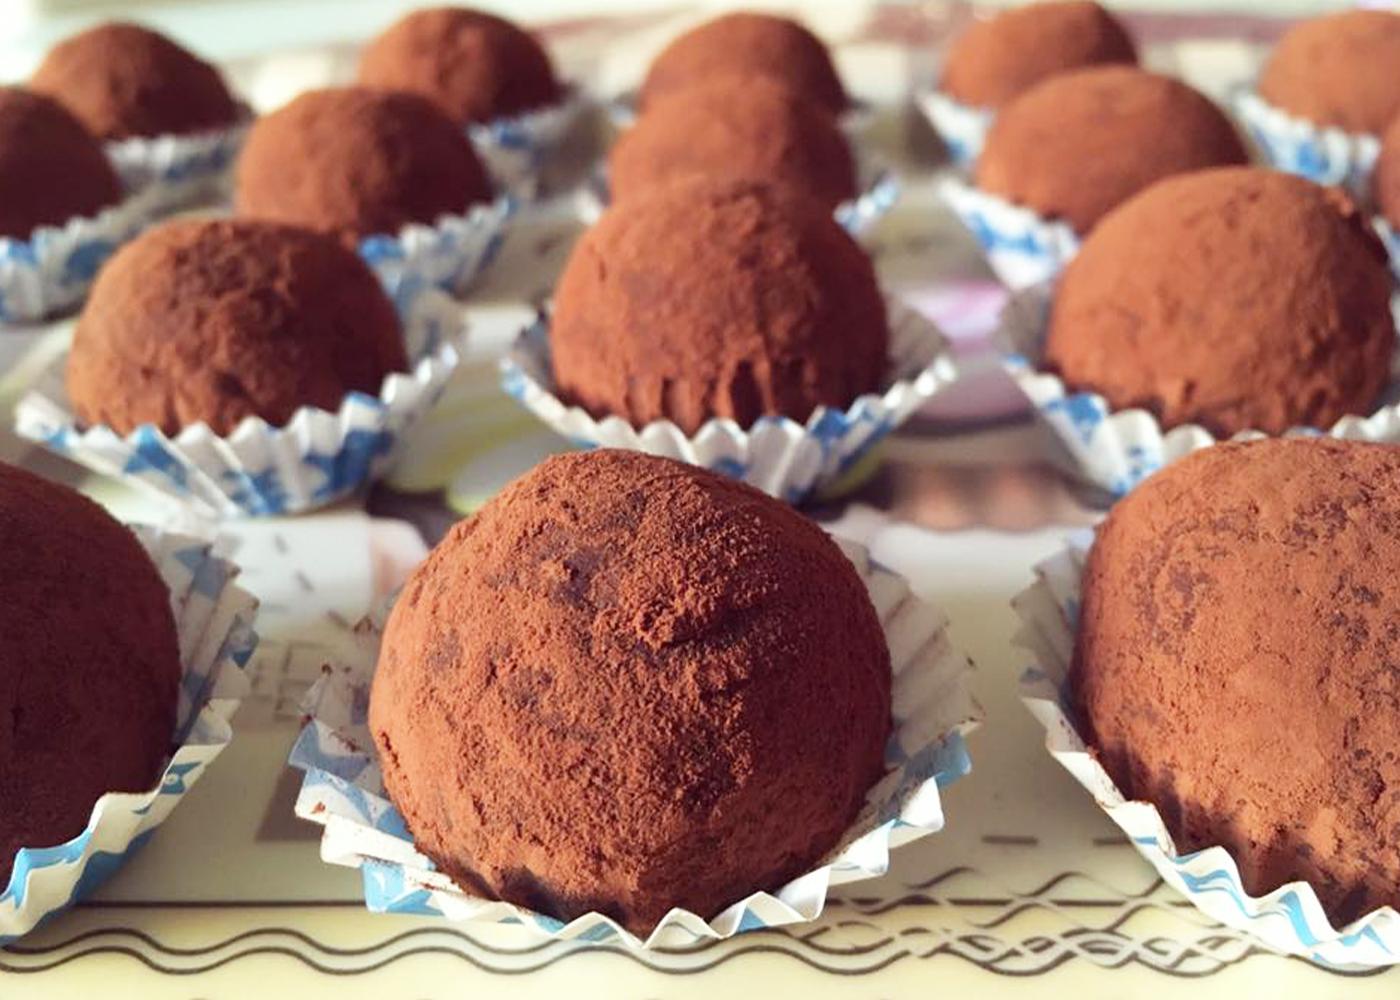 Tiramisu Ricetta Originale Con Bimby.Tartufini Al Tiramisu Con Bimby Ricetta Golosa Food Blog